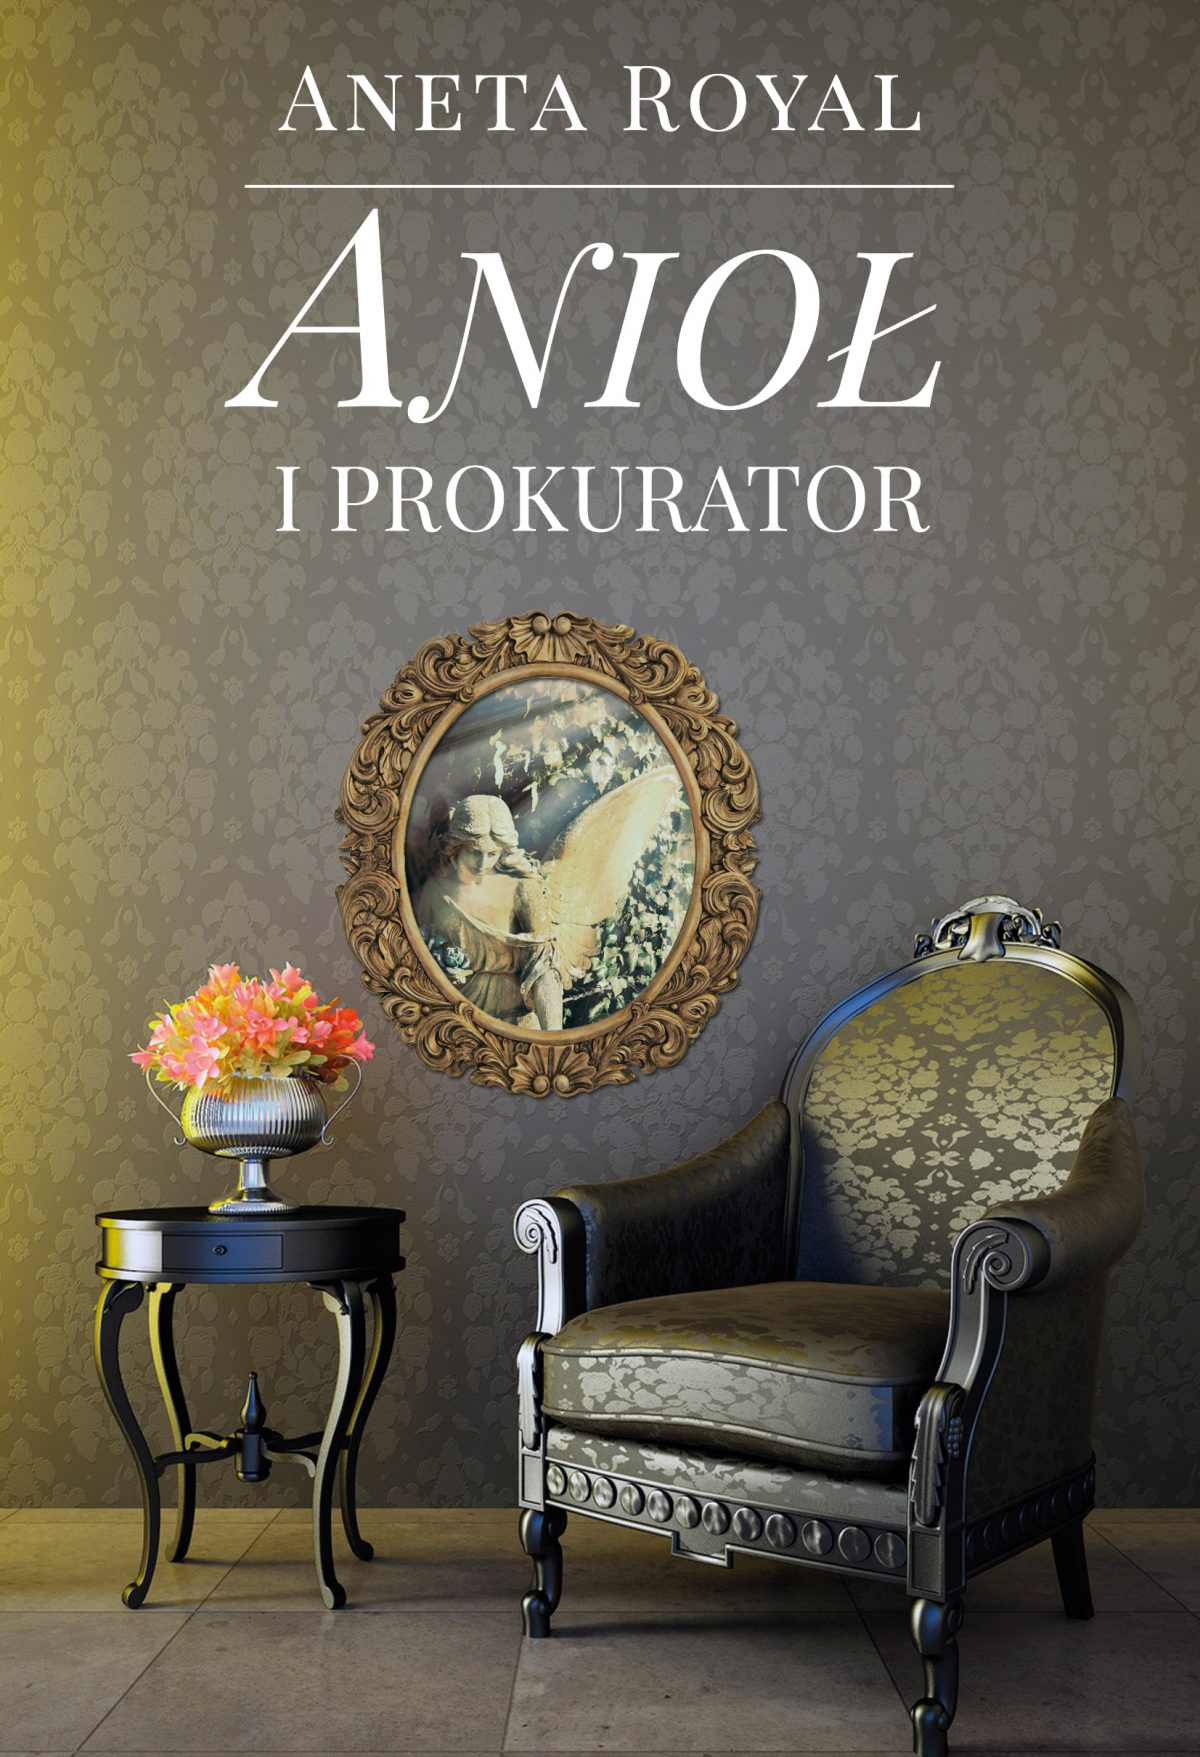 Anioł i prokurator - Ebook (Książka EPUB) do pobrania w formacie EPUB